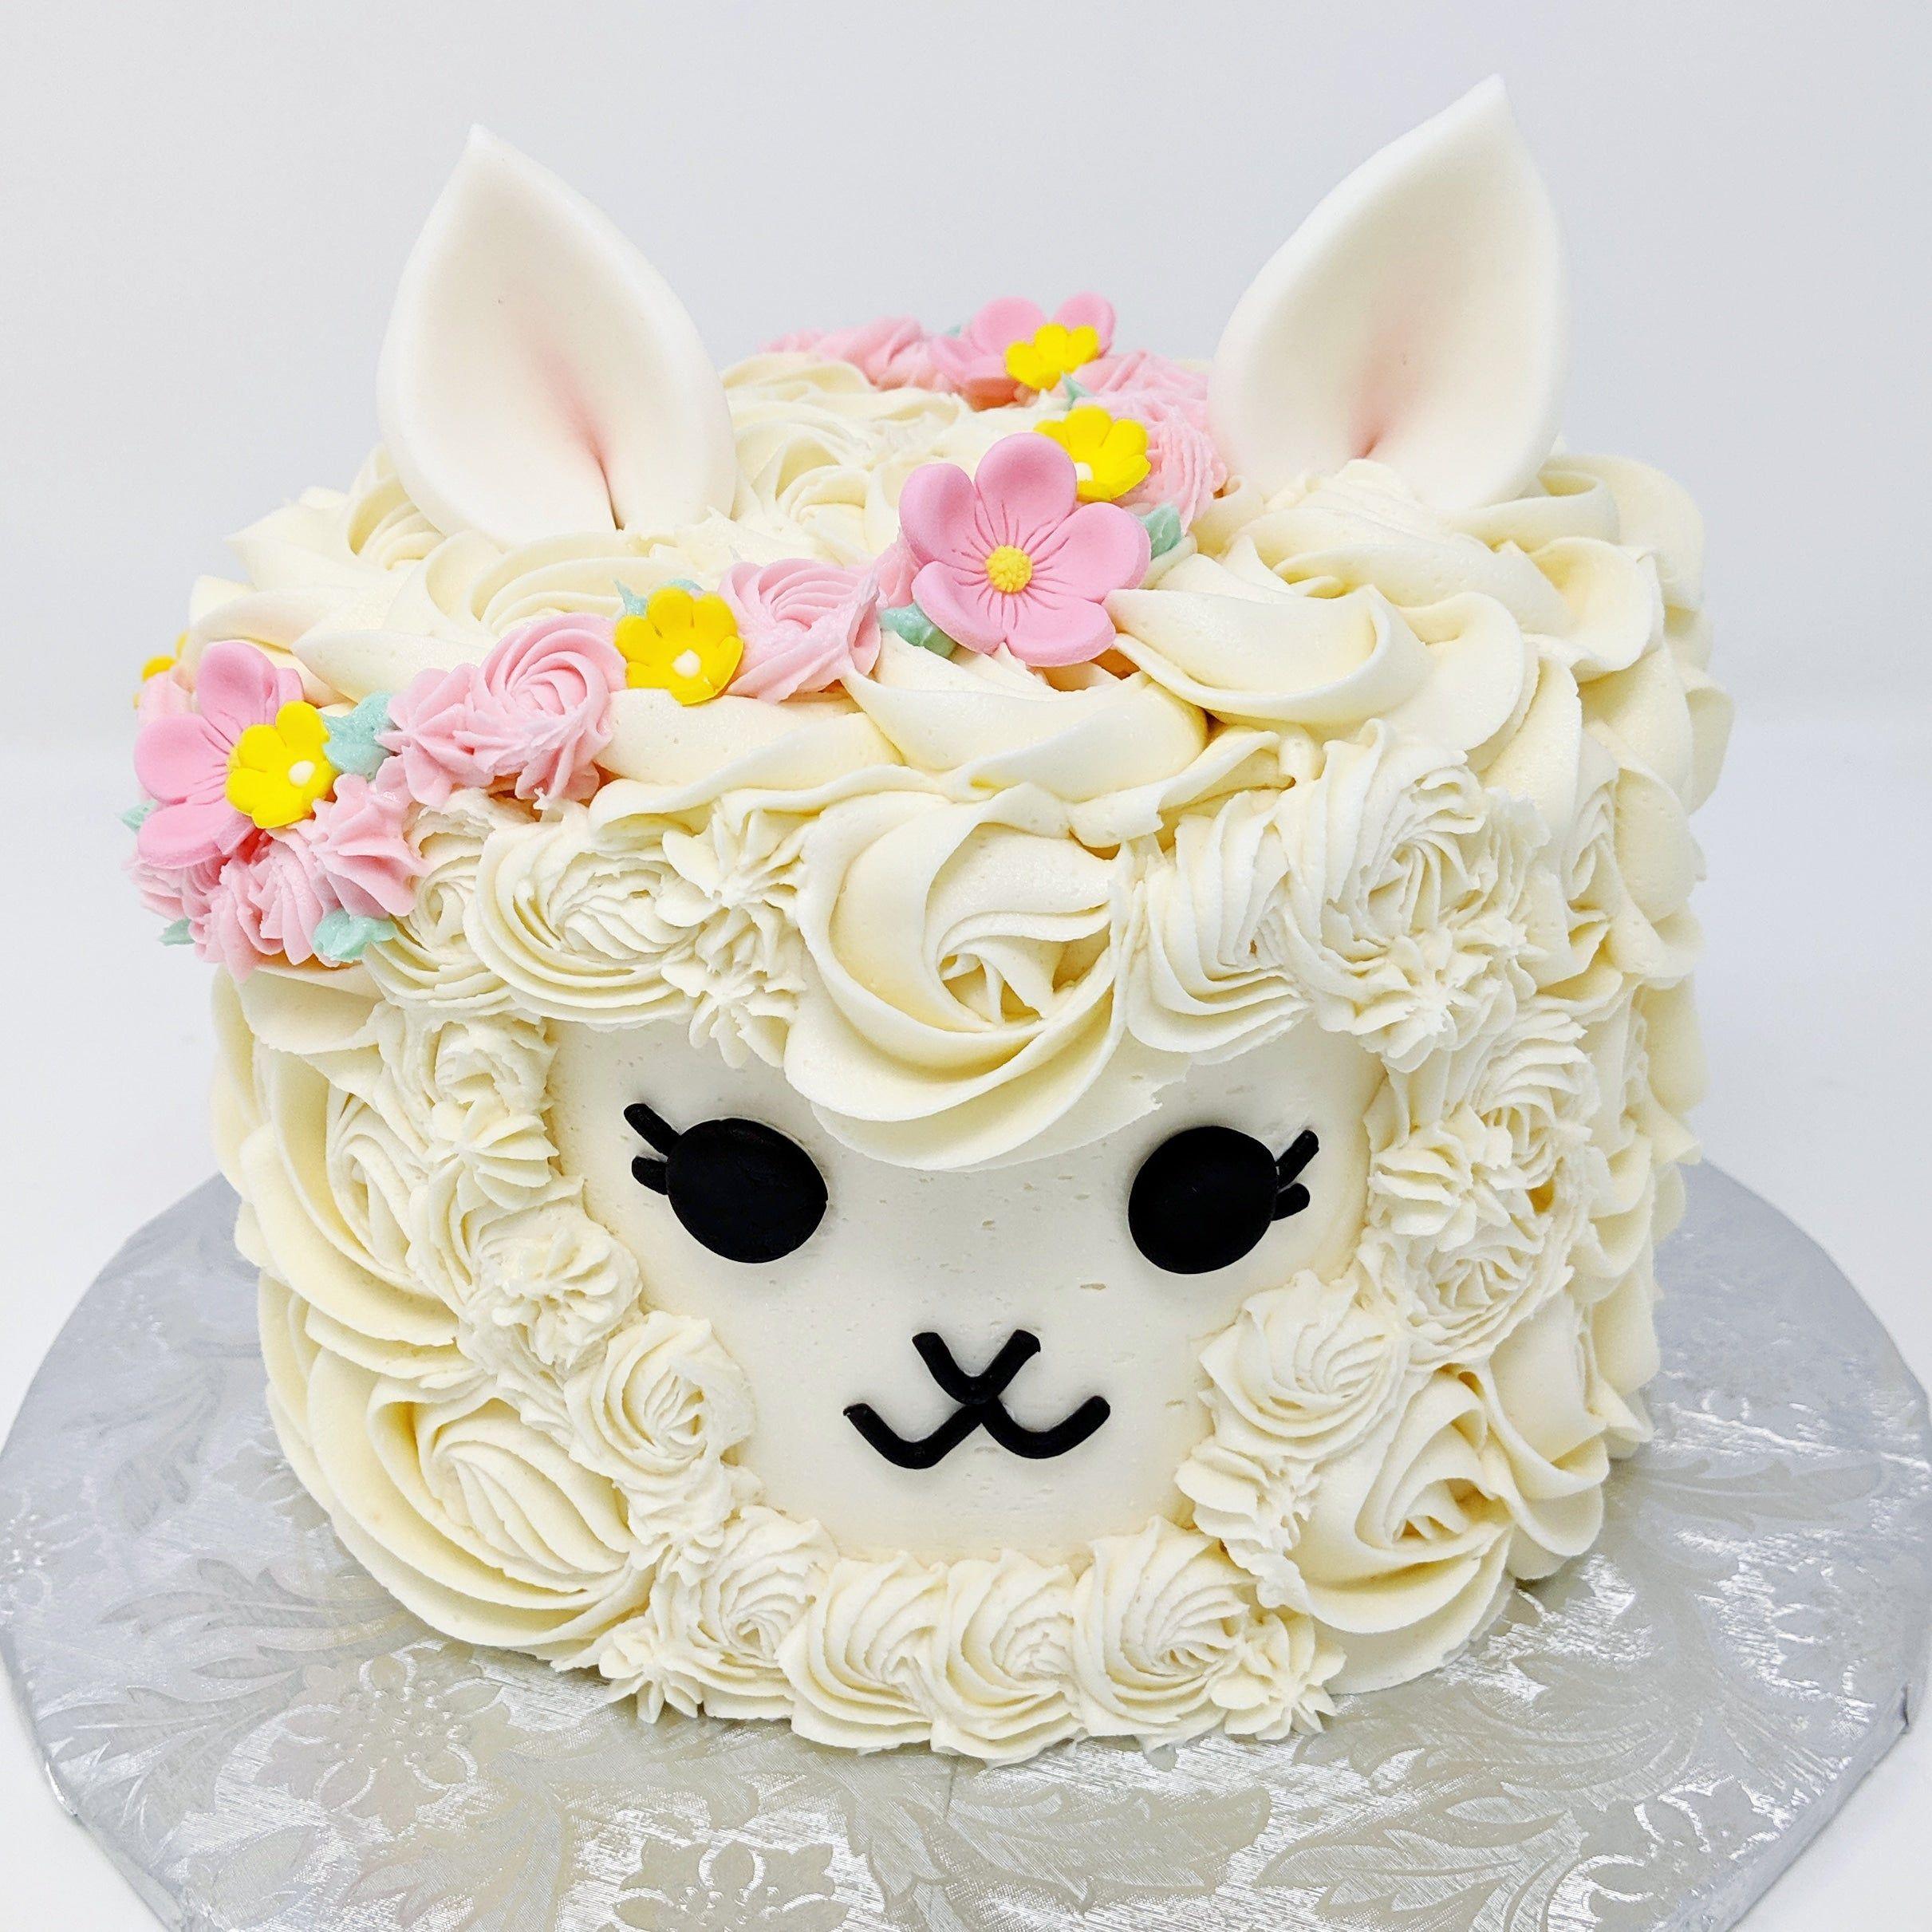 I made a cute Llama cake! And to think, tomorrow a one